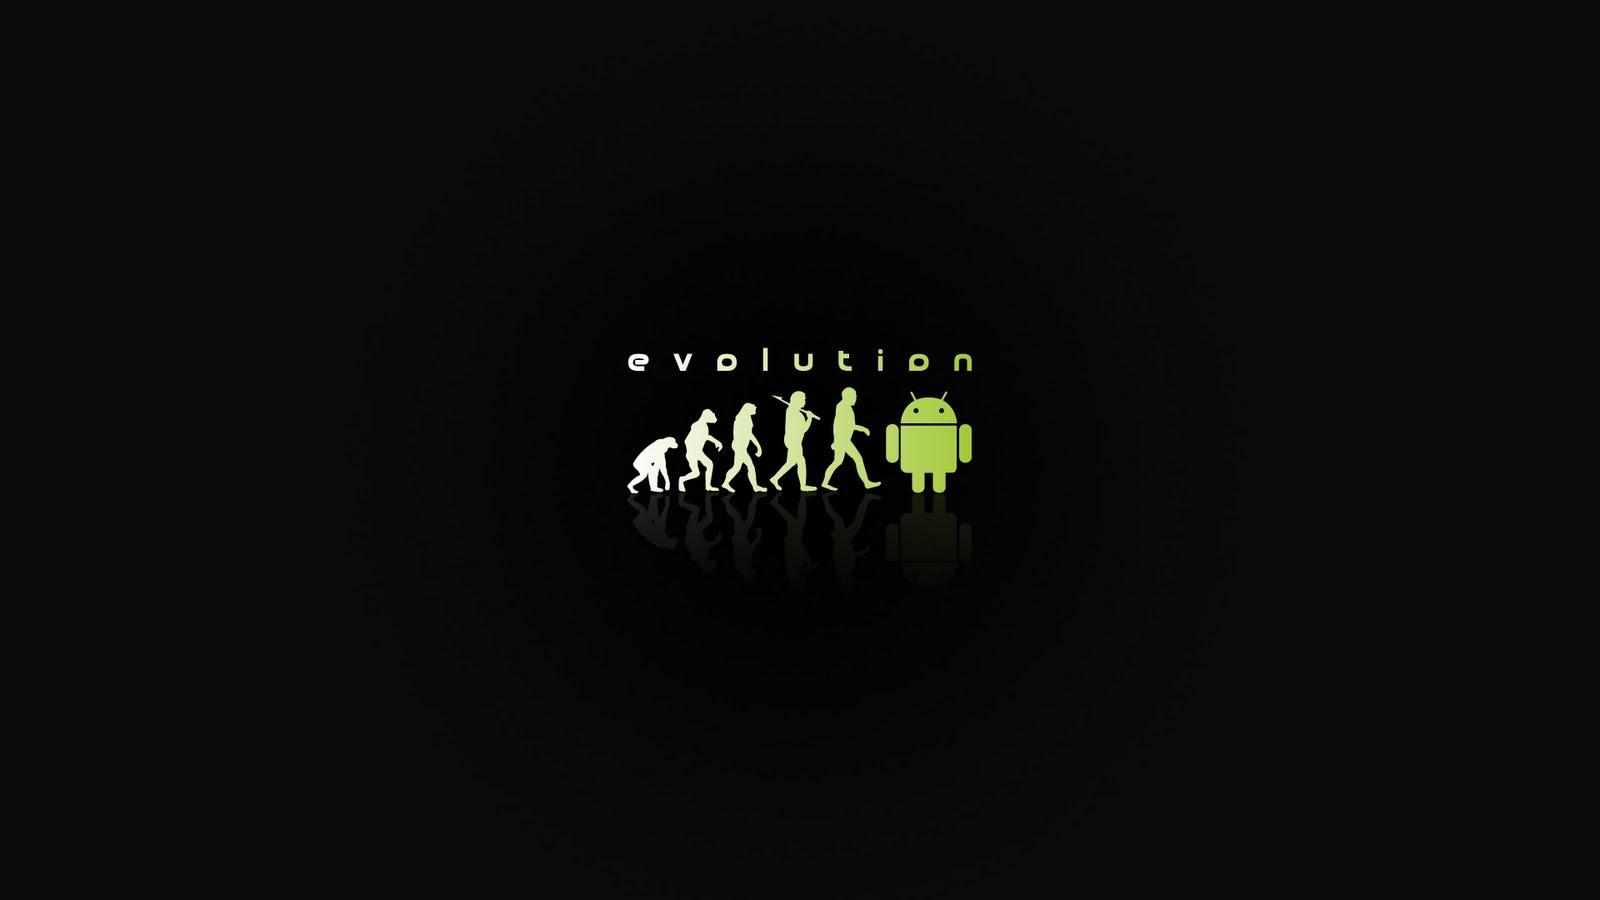 http://3.bp.blogspot.com/-WOJvPrUNBs8/TwE0YIUn3FI/AAAAAAAAAPw/aHWpvNslKDg/s1600/18784-desktop-wallpapers-android-evolution.jpg